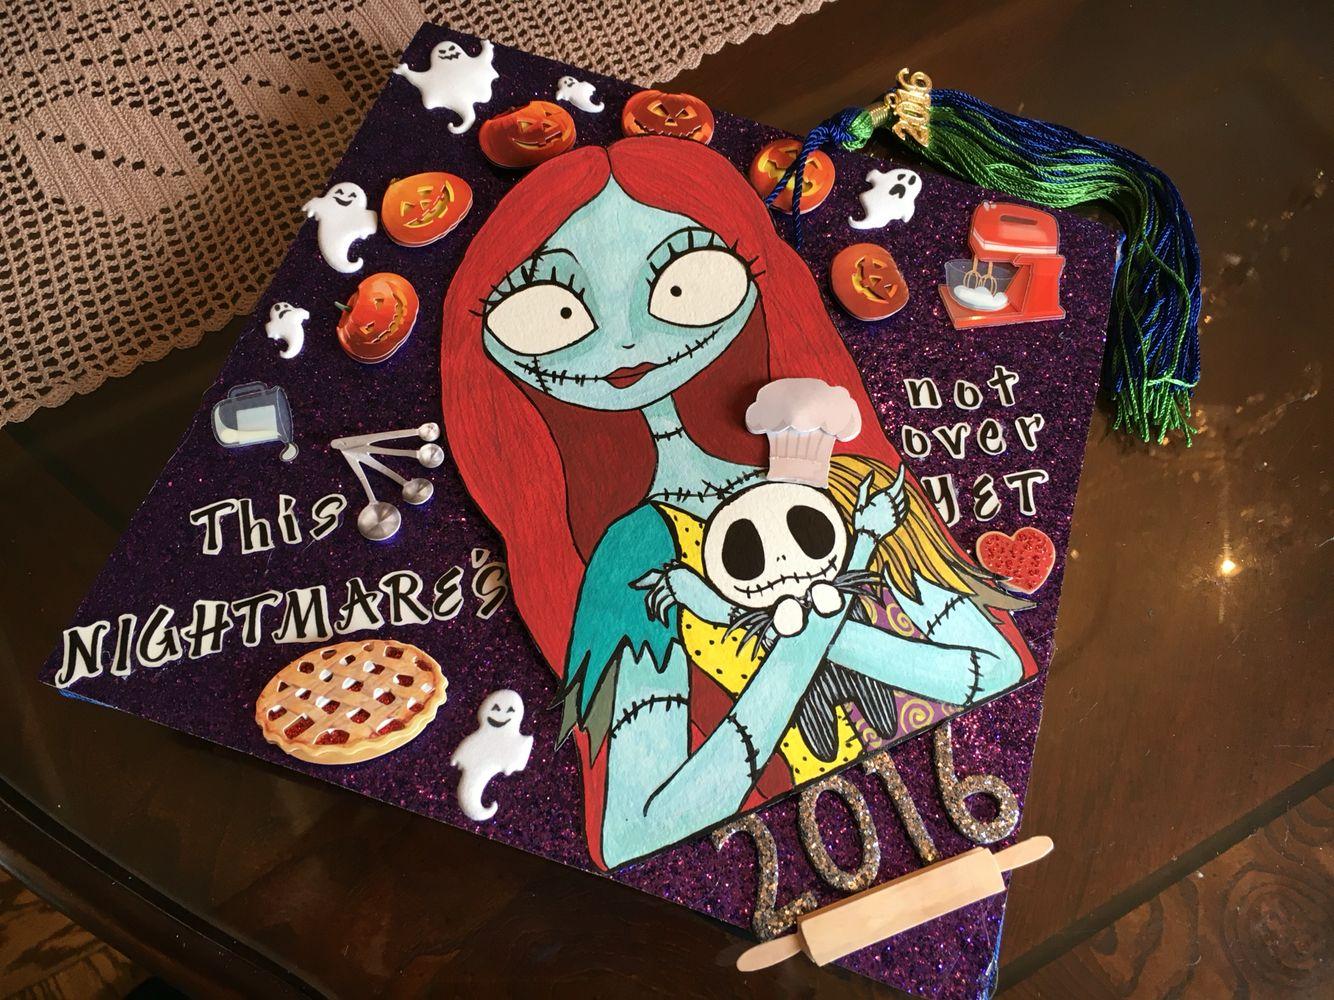 b2ca35df This NIGHTMARE'S not over YET ' 2016 graduation cap . my original design  .purple